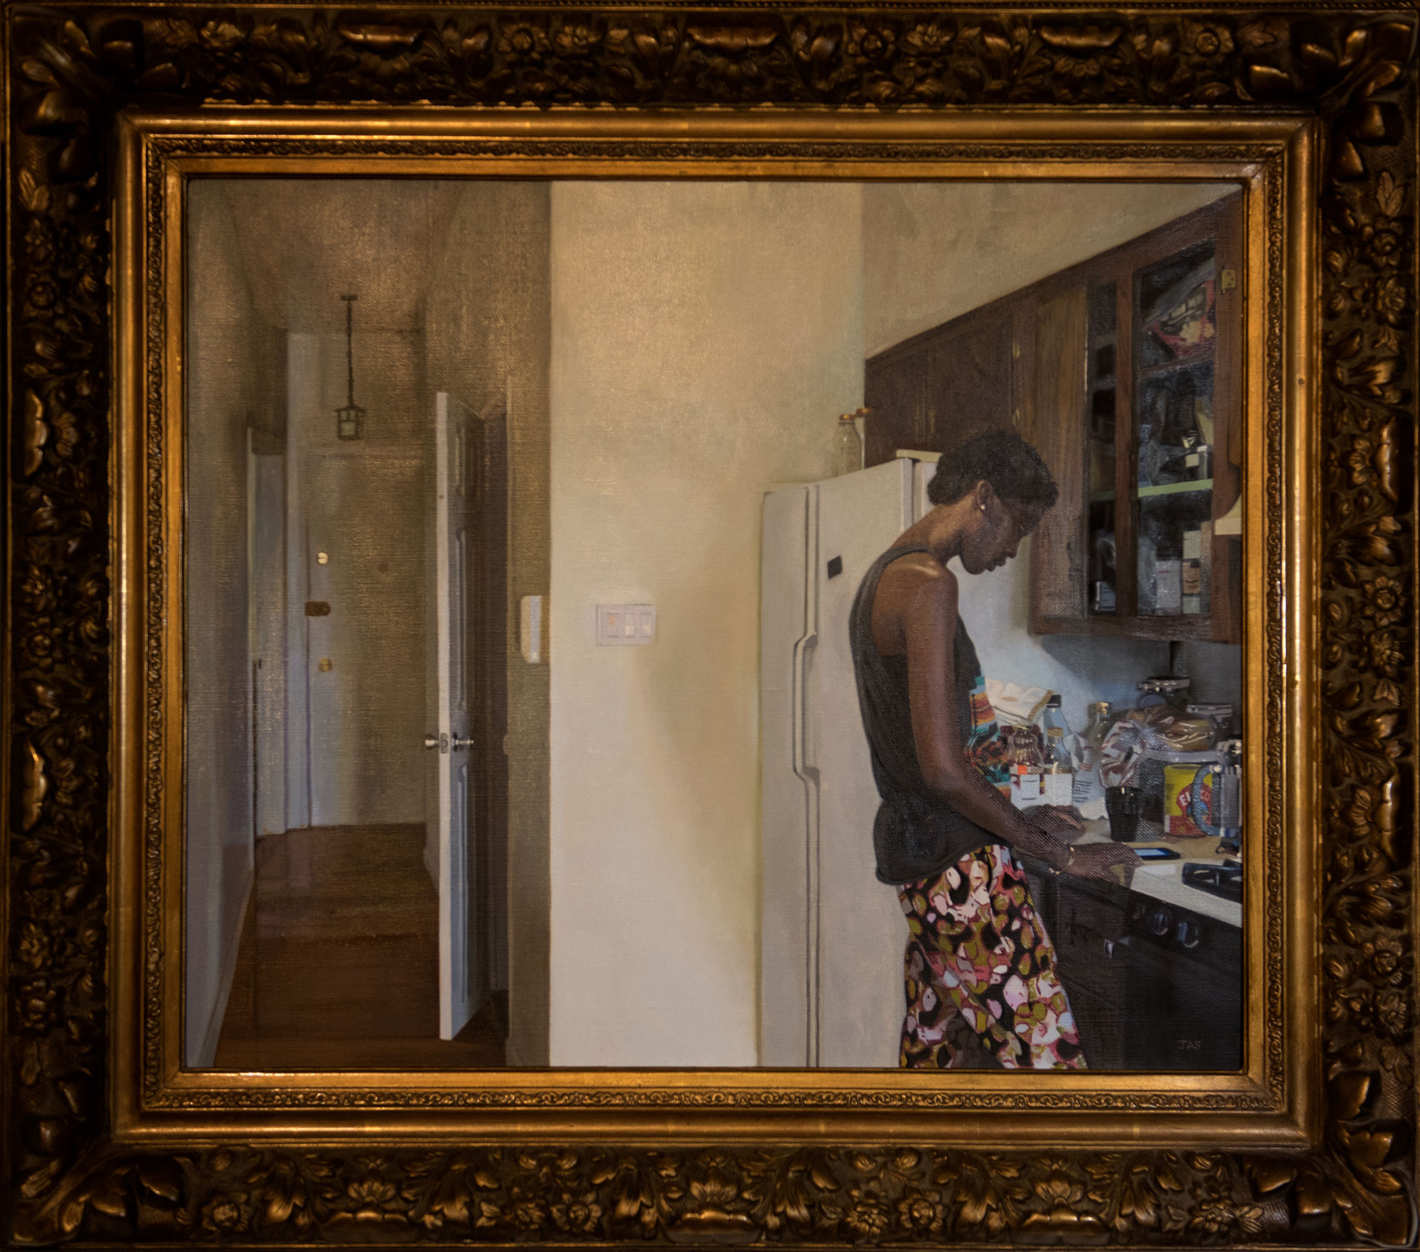 Cooper Cafritz, African American Art, Black Art, African American Art Museum, Black Art Museum, KINDR'D Magazine, KINDR'D